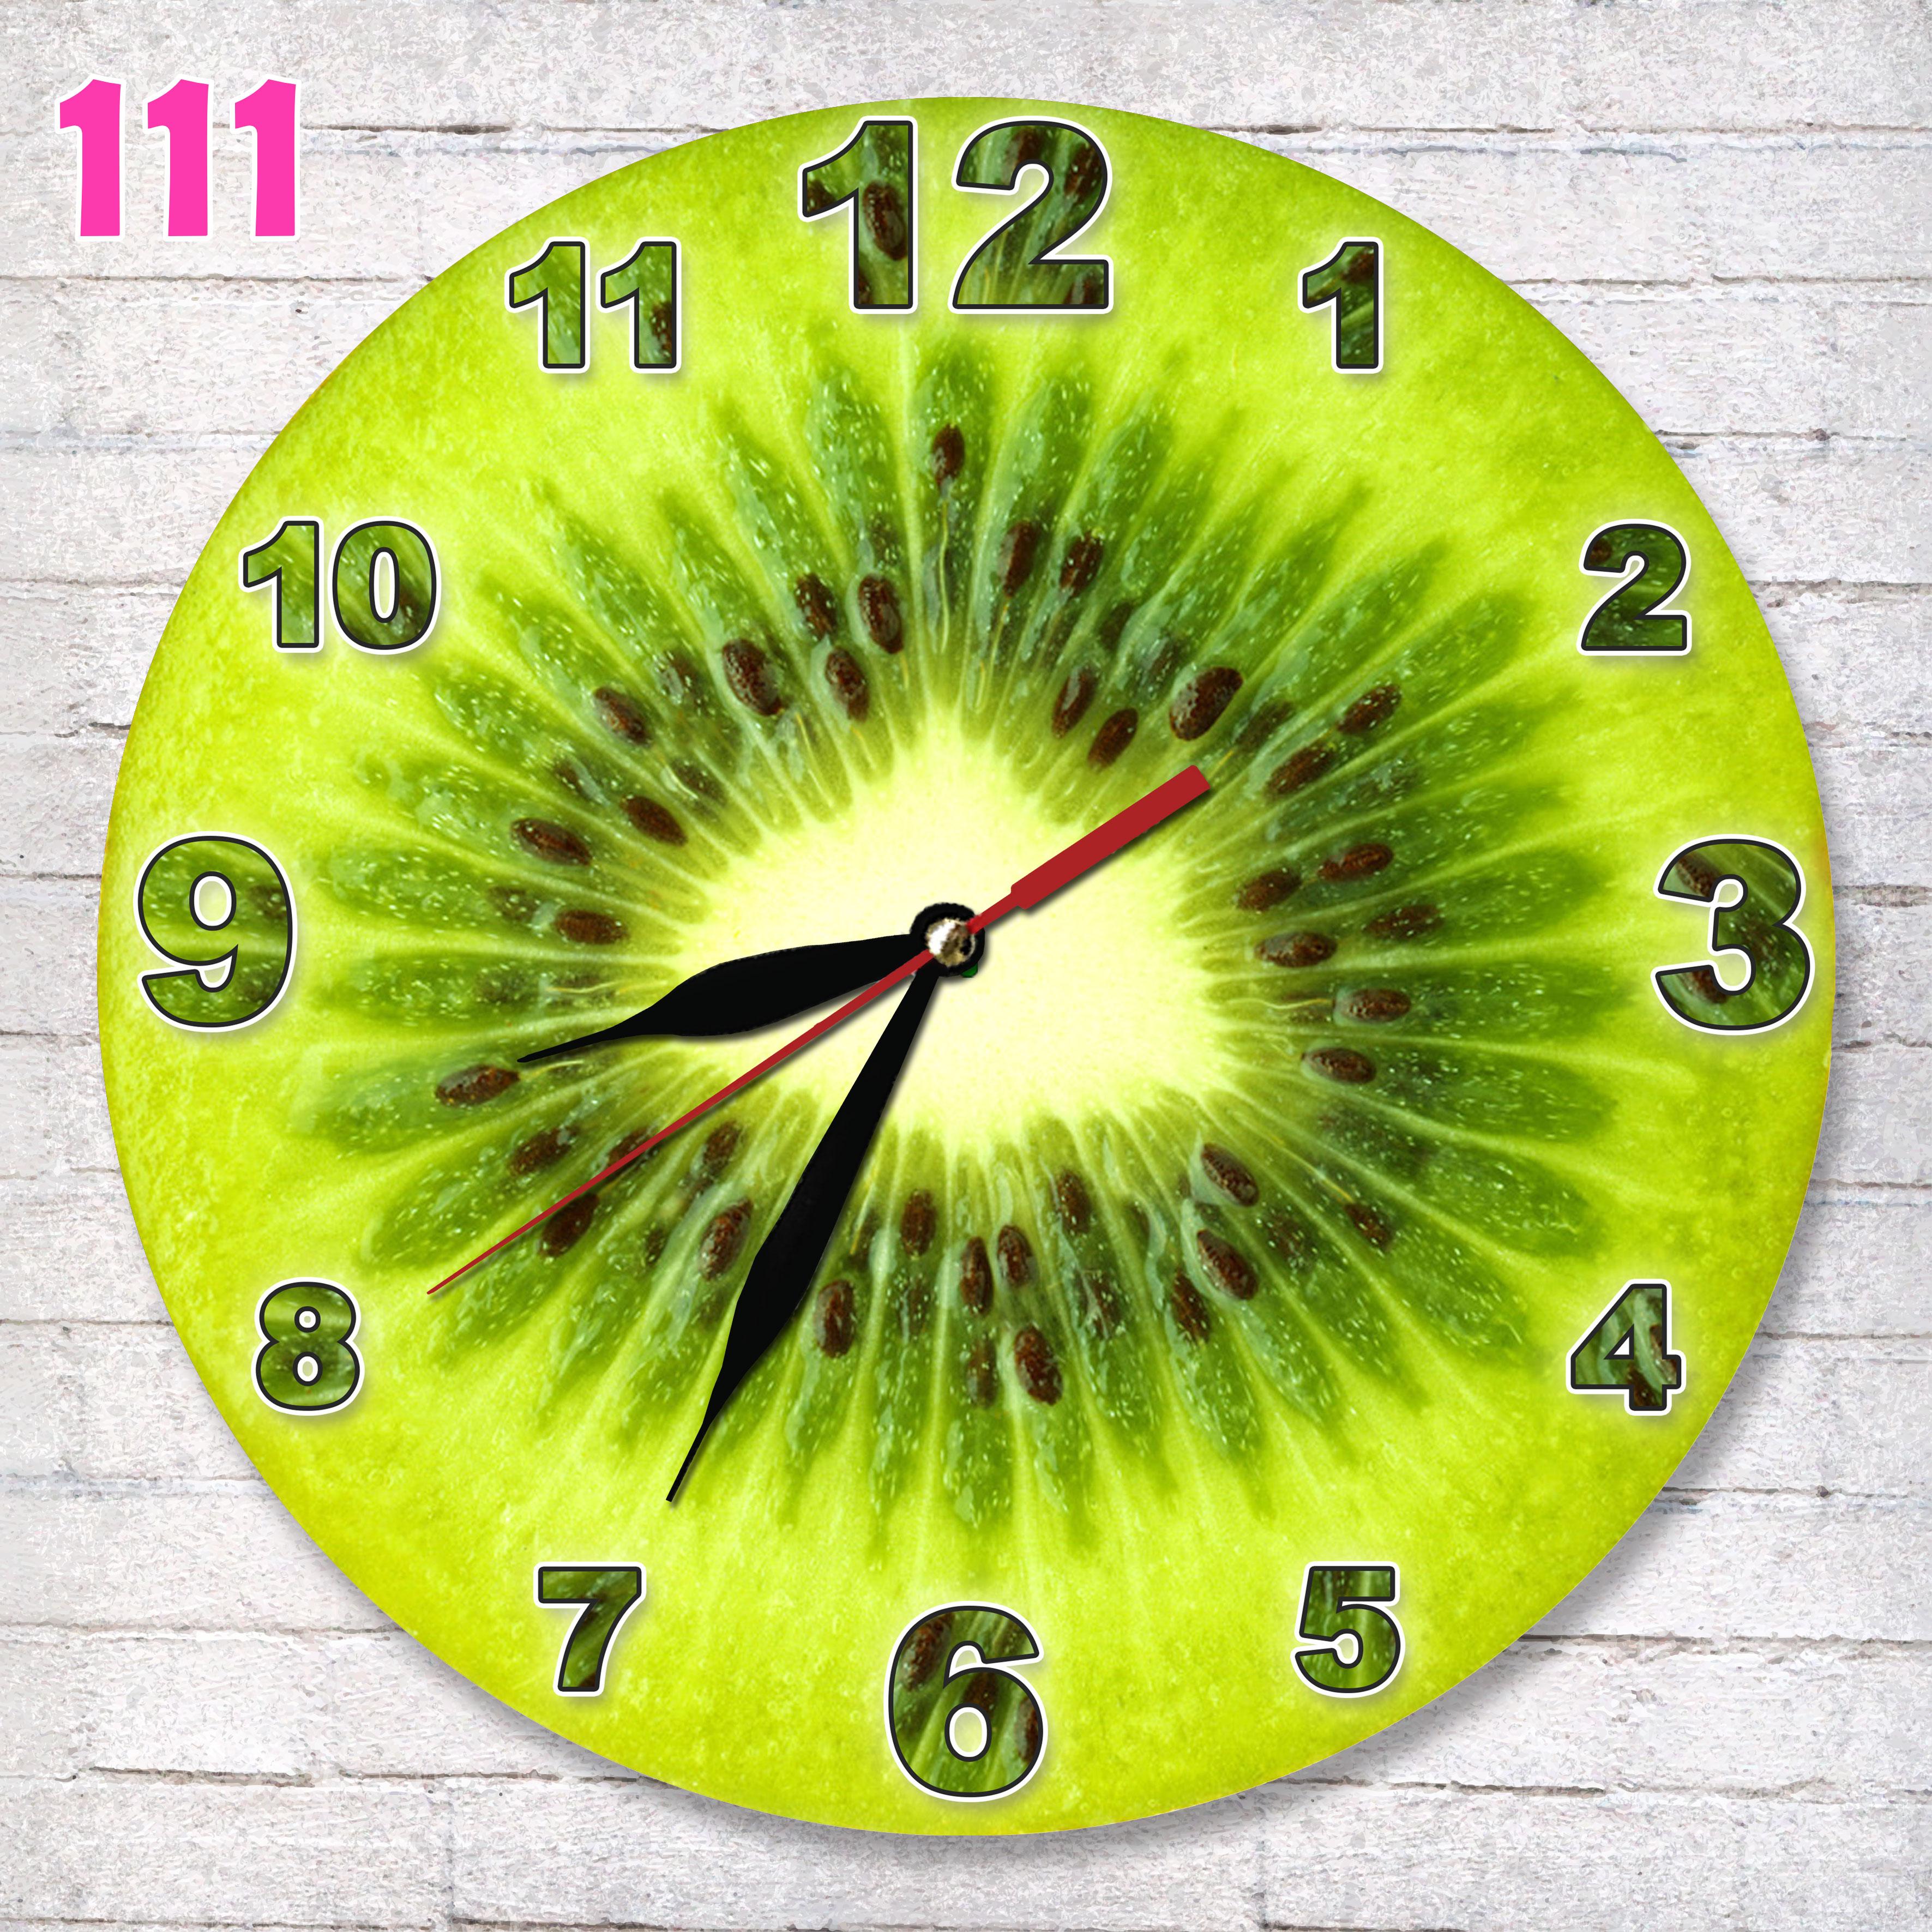 111 hiasan ruang jam dinding mdf motif buah kiwi